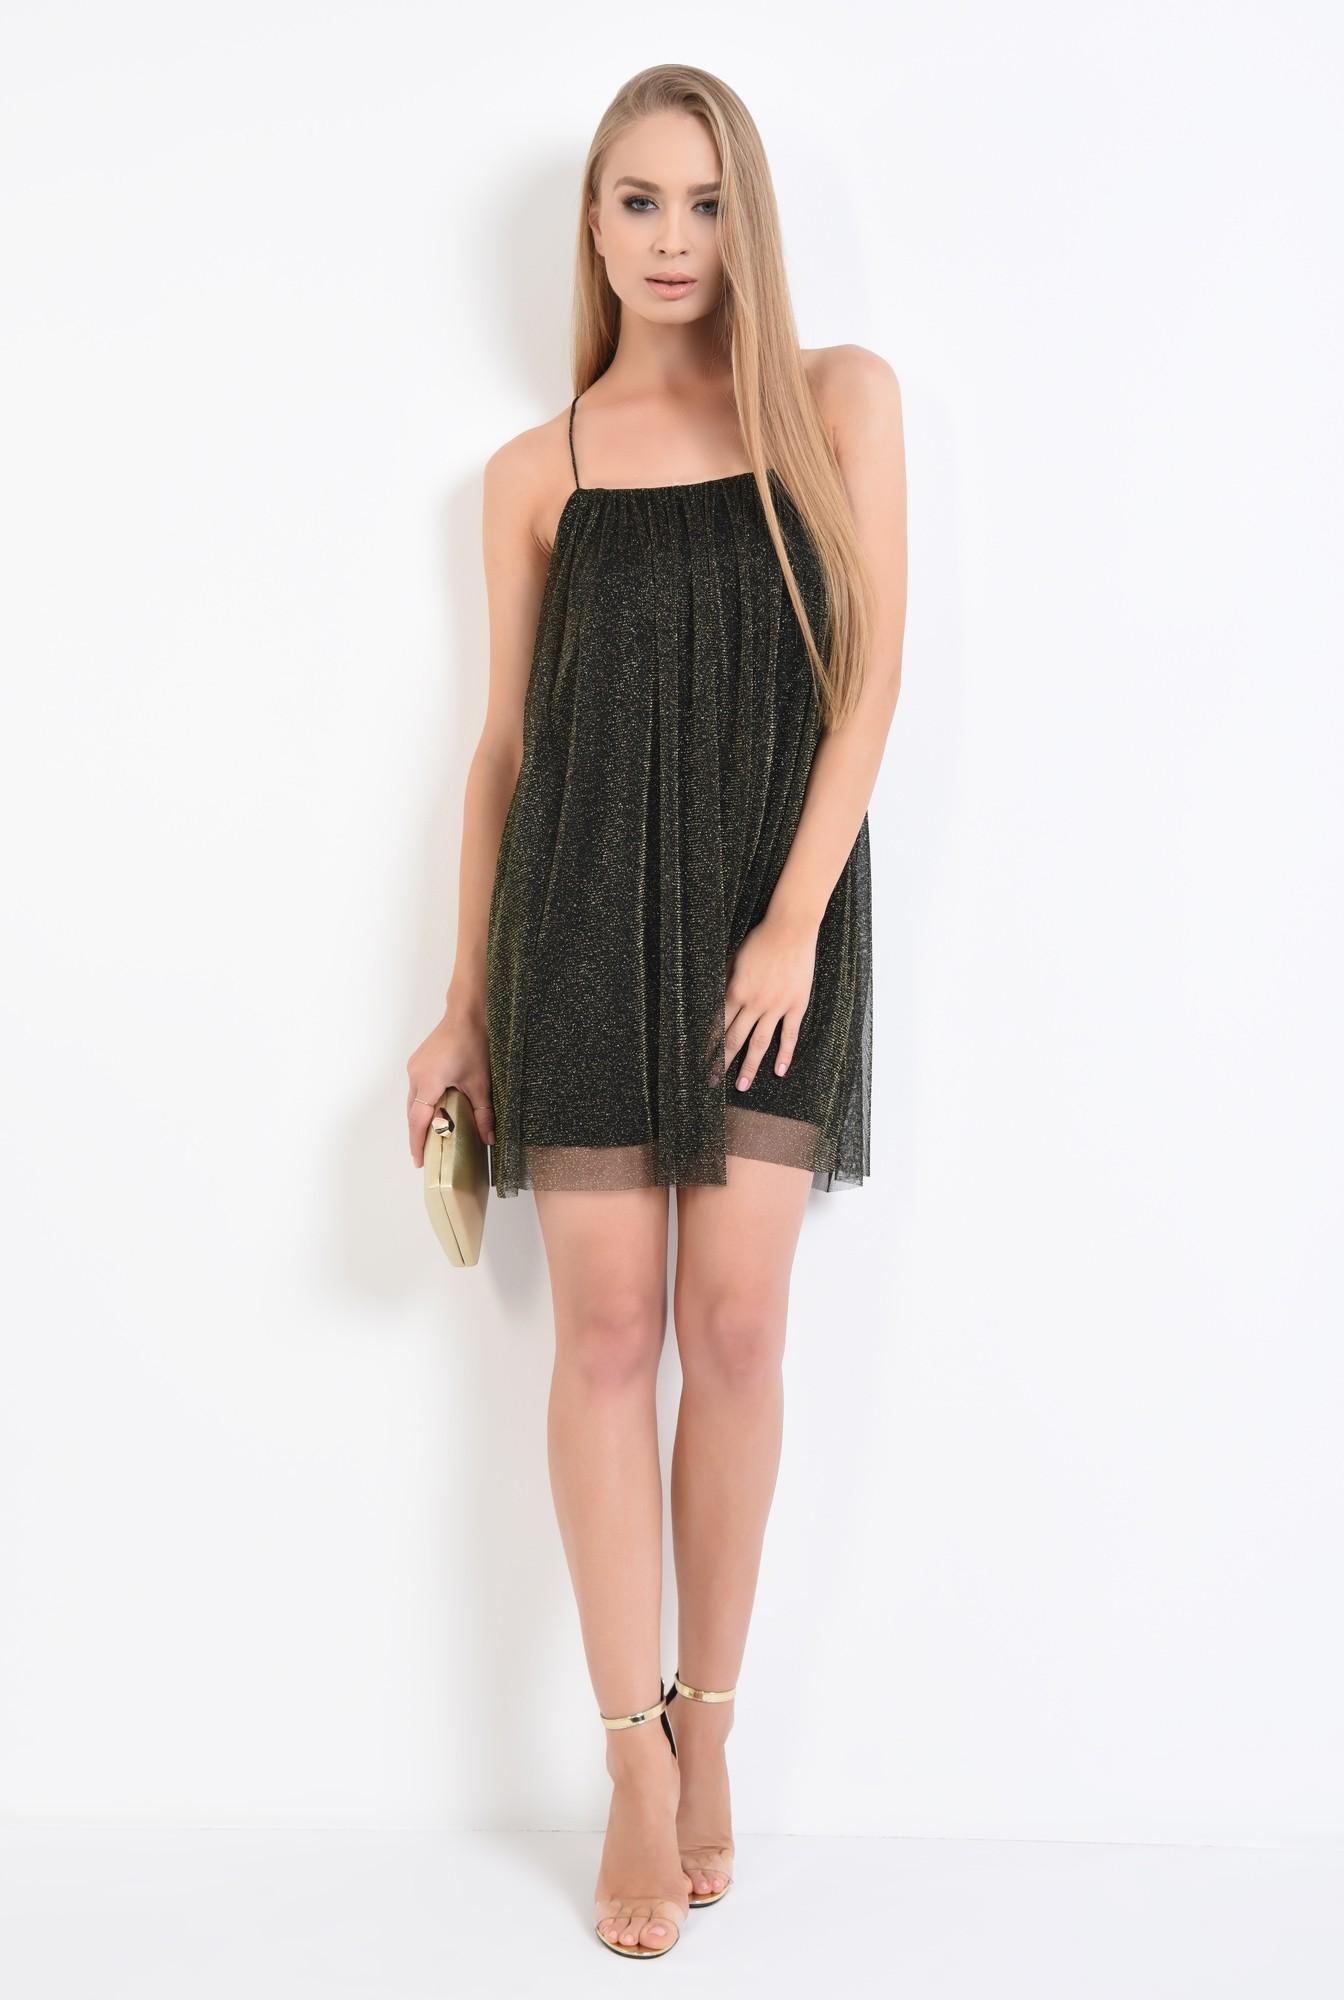 3 - rochie eleganta, negru, bretele subtiri, mini